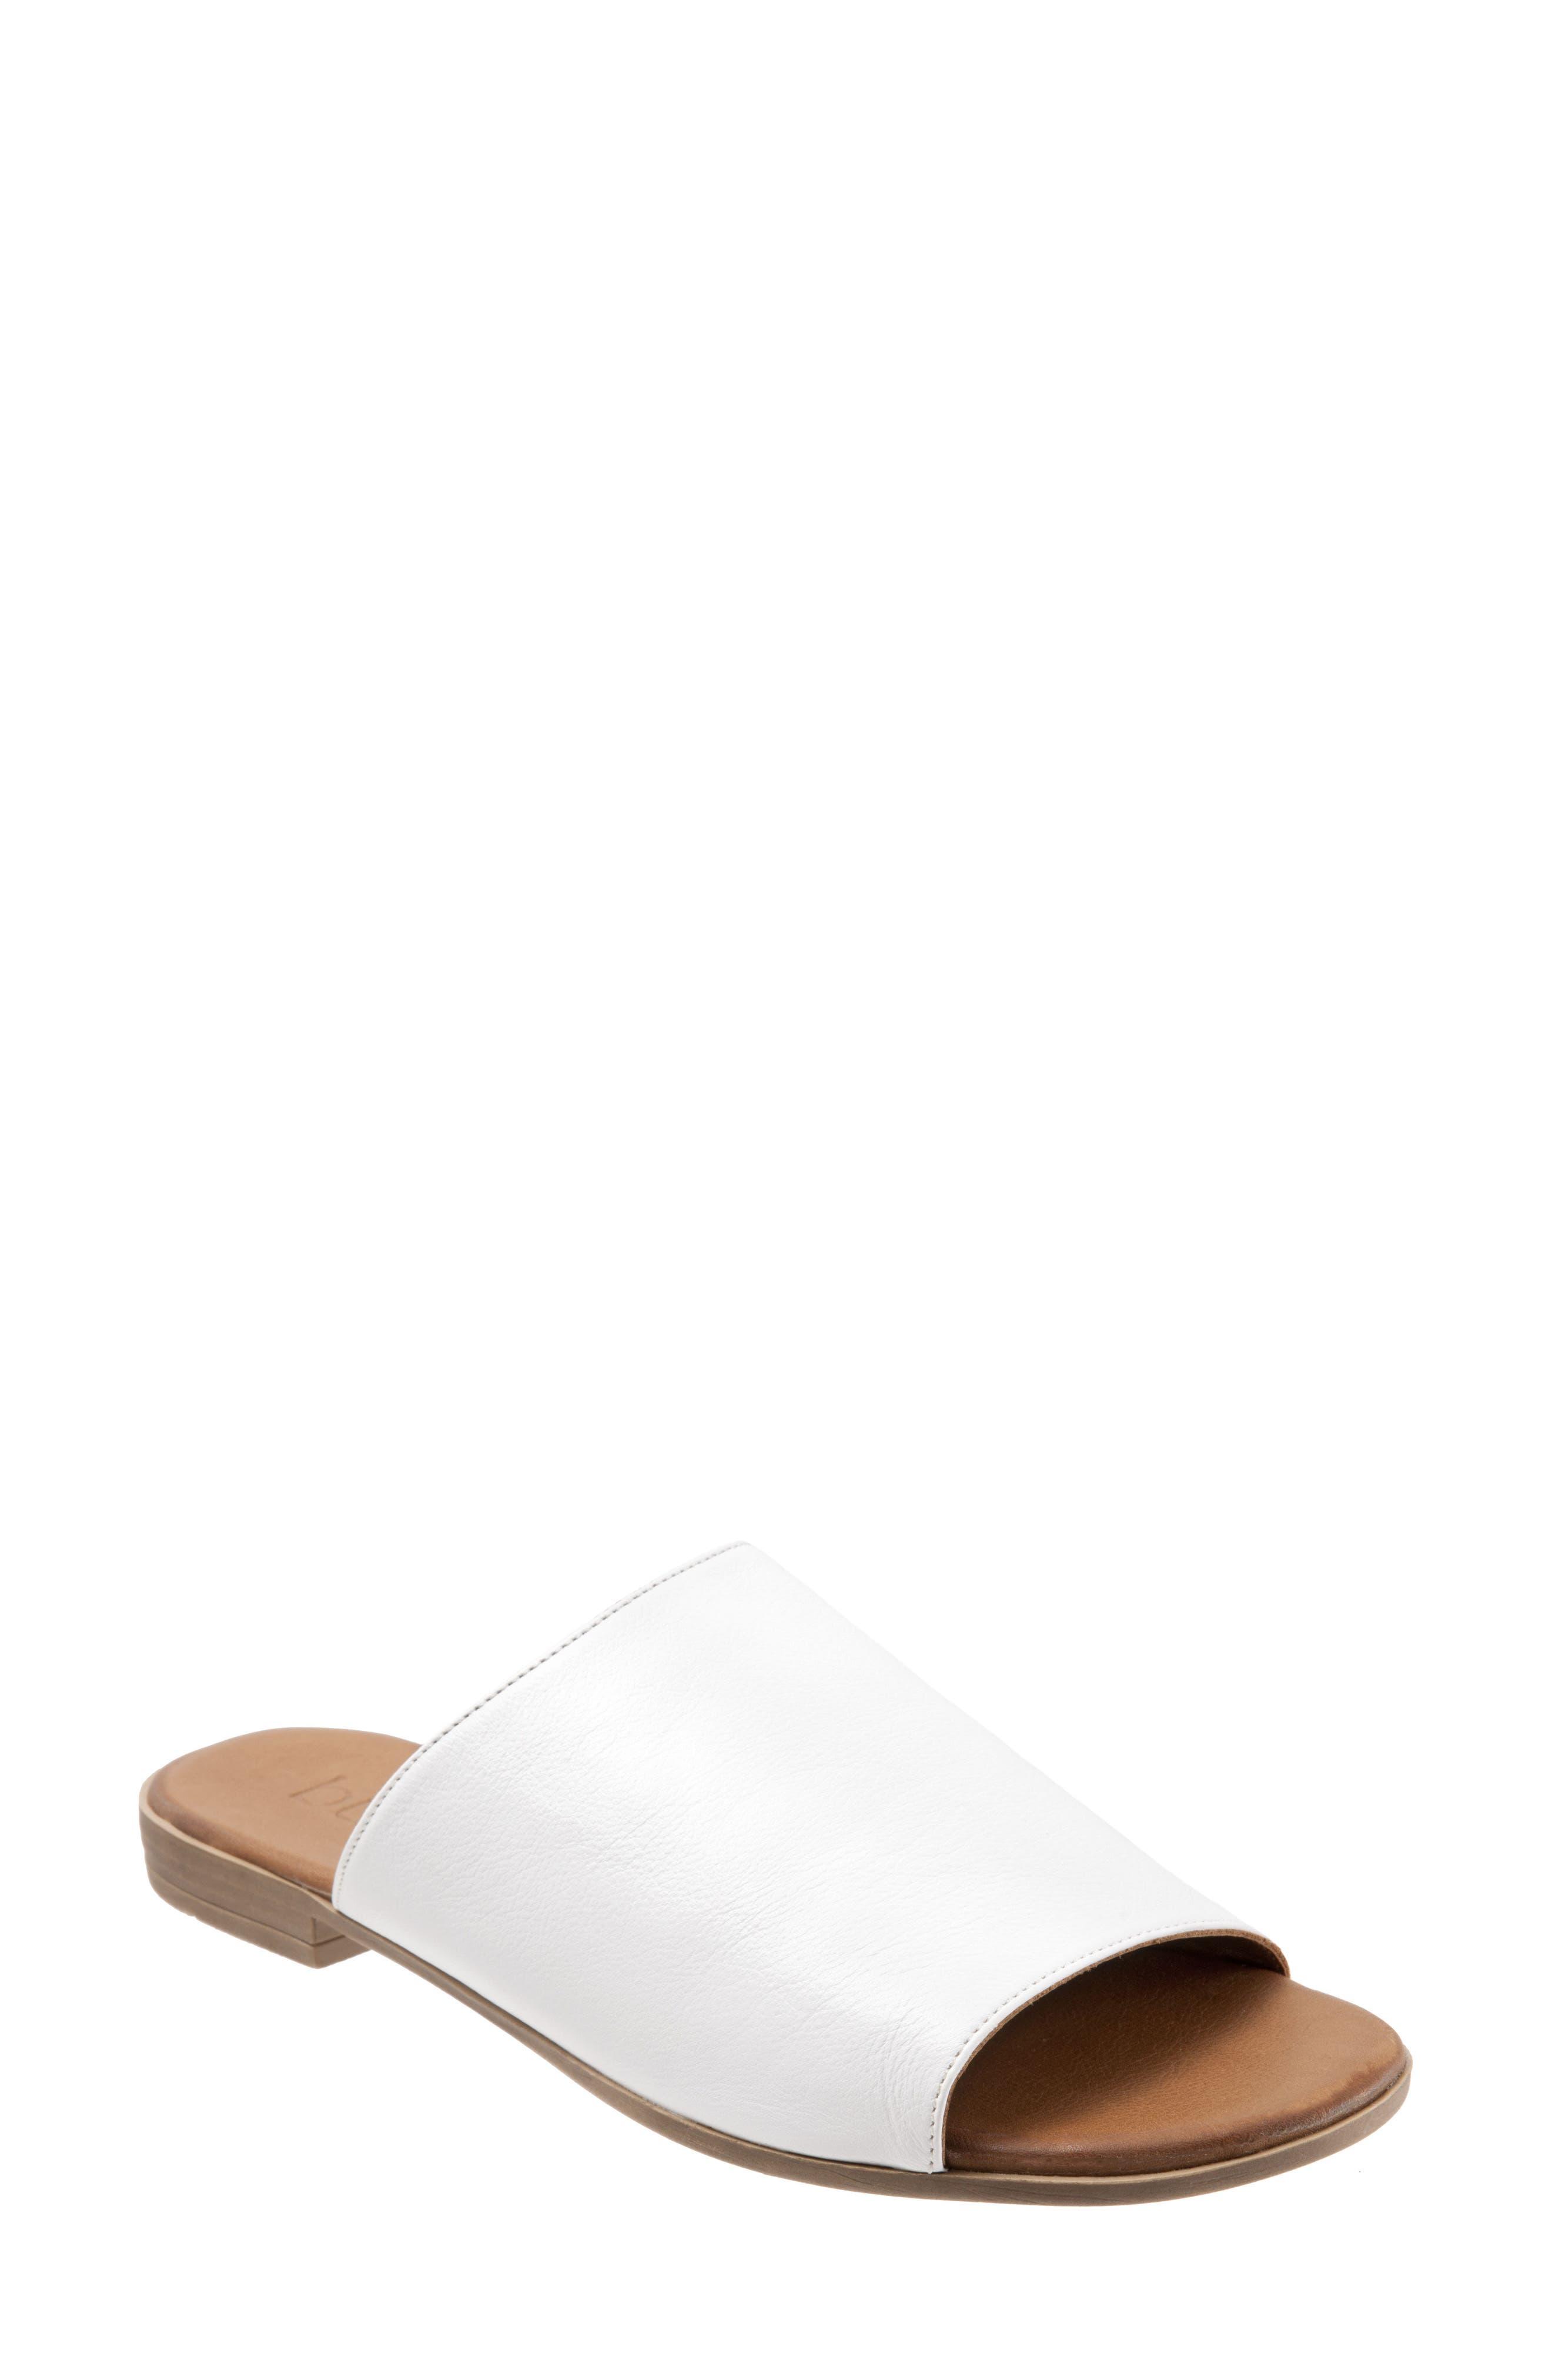 Jory Slide Sandal,                             Main thumbnail 1, color,                             White Leather